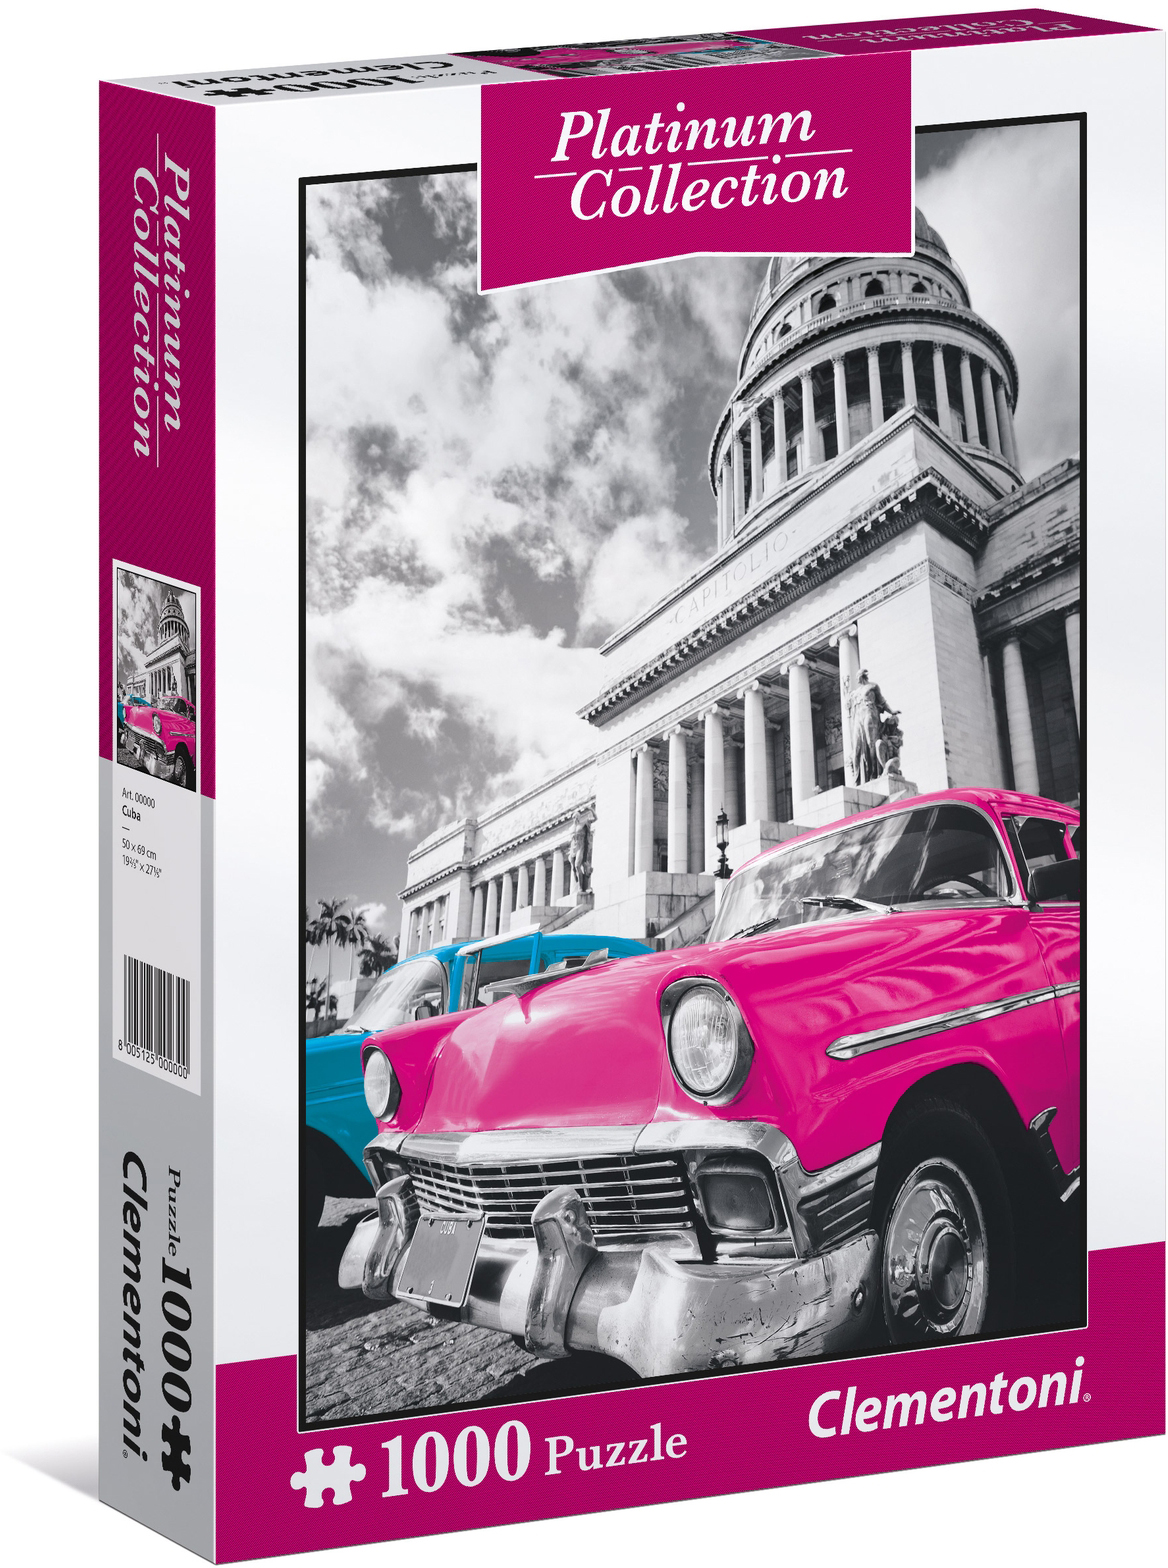 Clementoni Пазл Куба 1000 элементов пазл французский парусник clementoni 1000 деталей